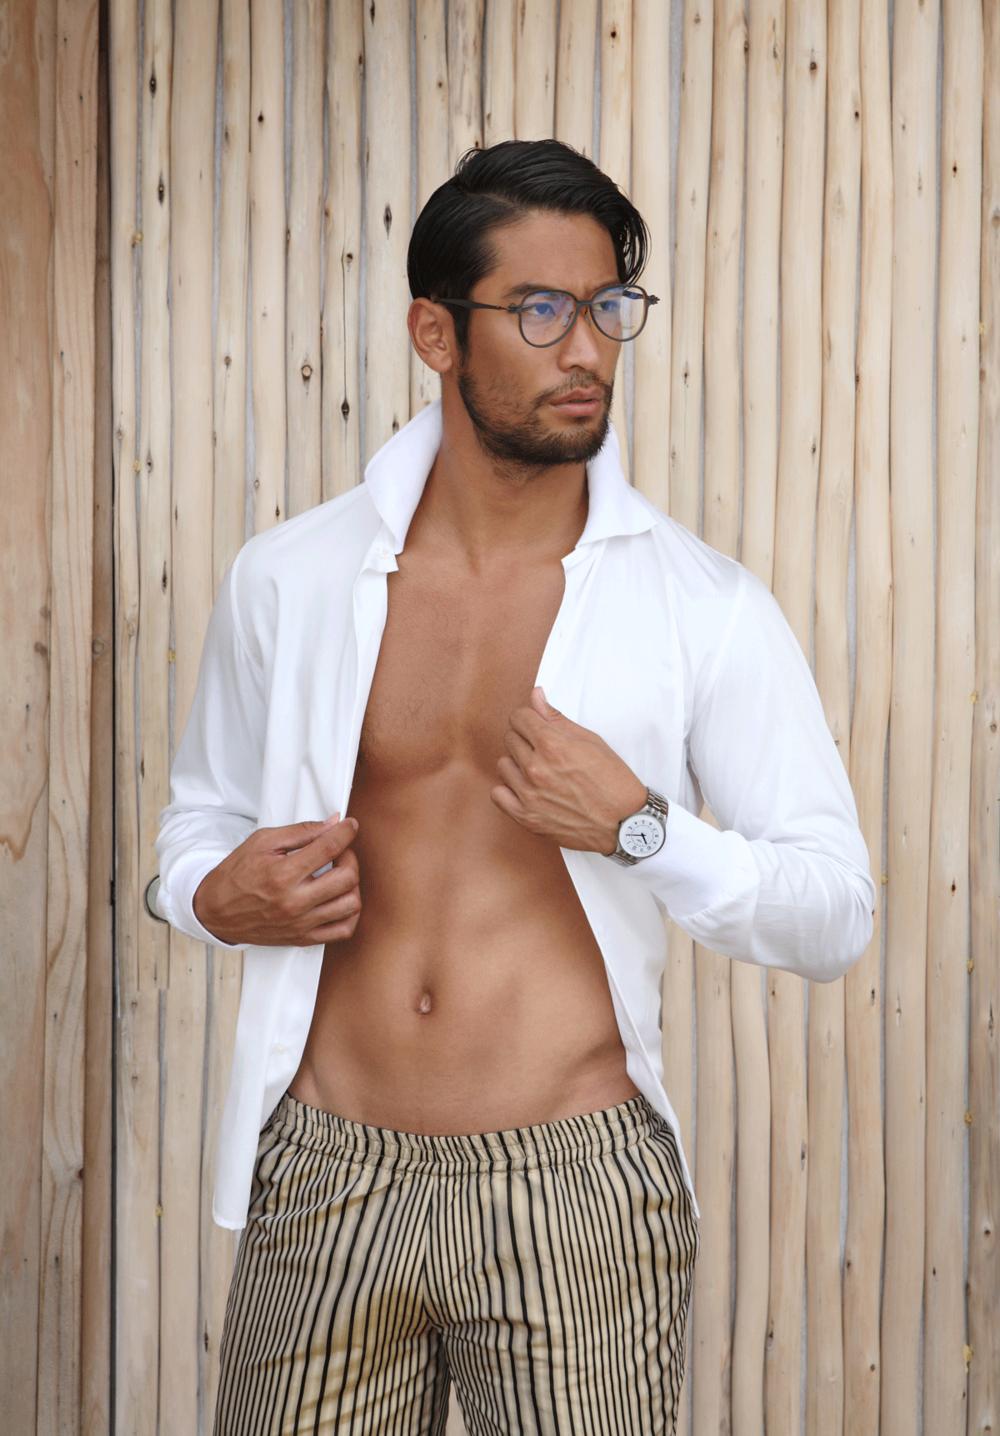 clothes : SARIT / eyeglasses : TAVAT / watch : SWATCH SKINSTEPS